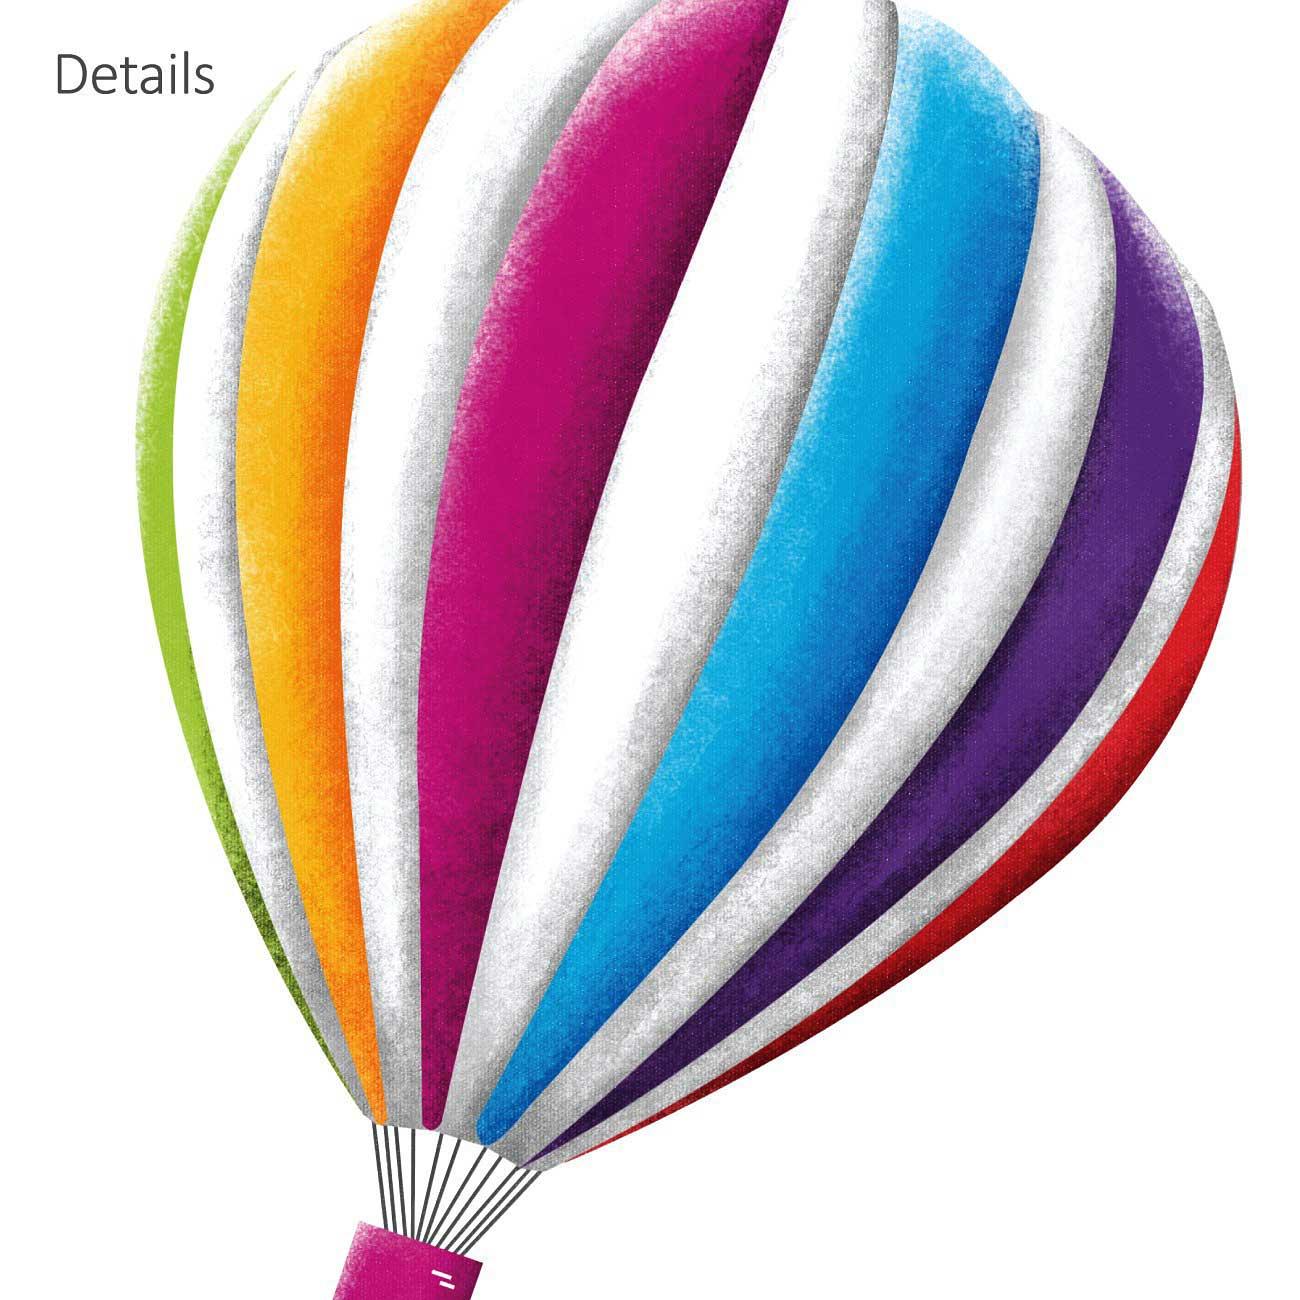 Wandsticker flugzeuge hei luftballons wandsticker kinderzimmer for Wandsticker jugendzimmer